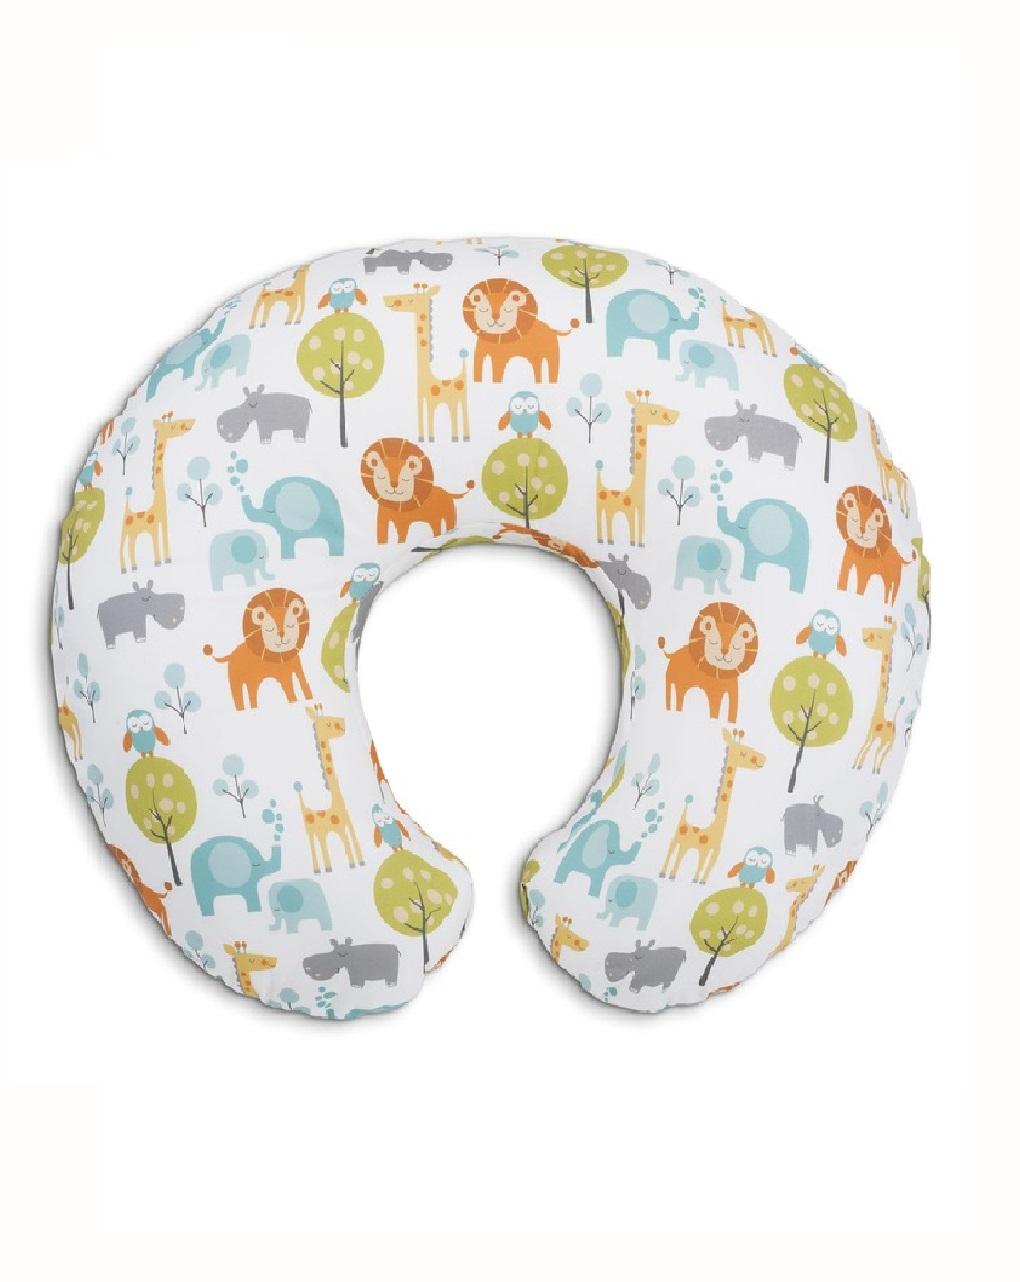 Boppy - almofada de enfermagem da selva pacífica - Boppy